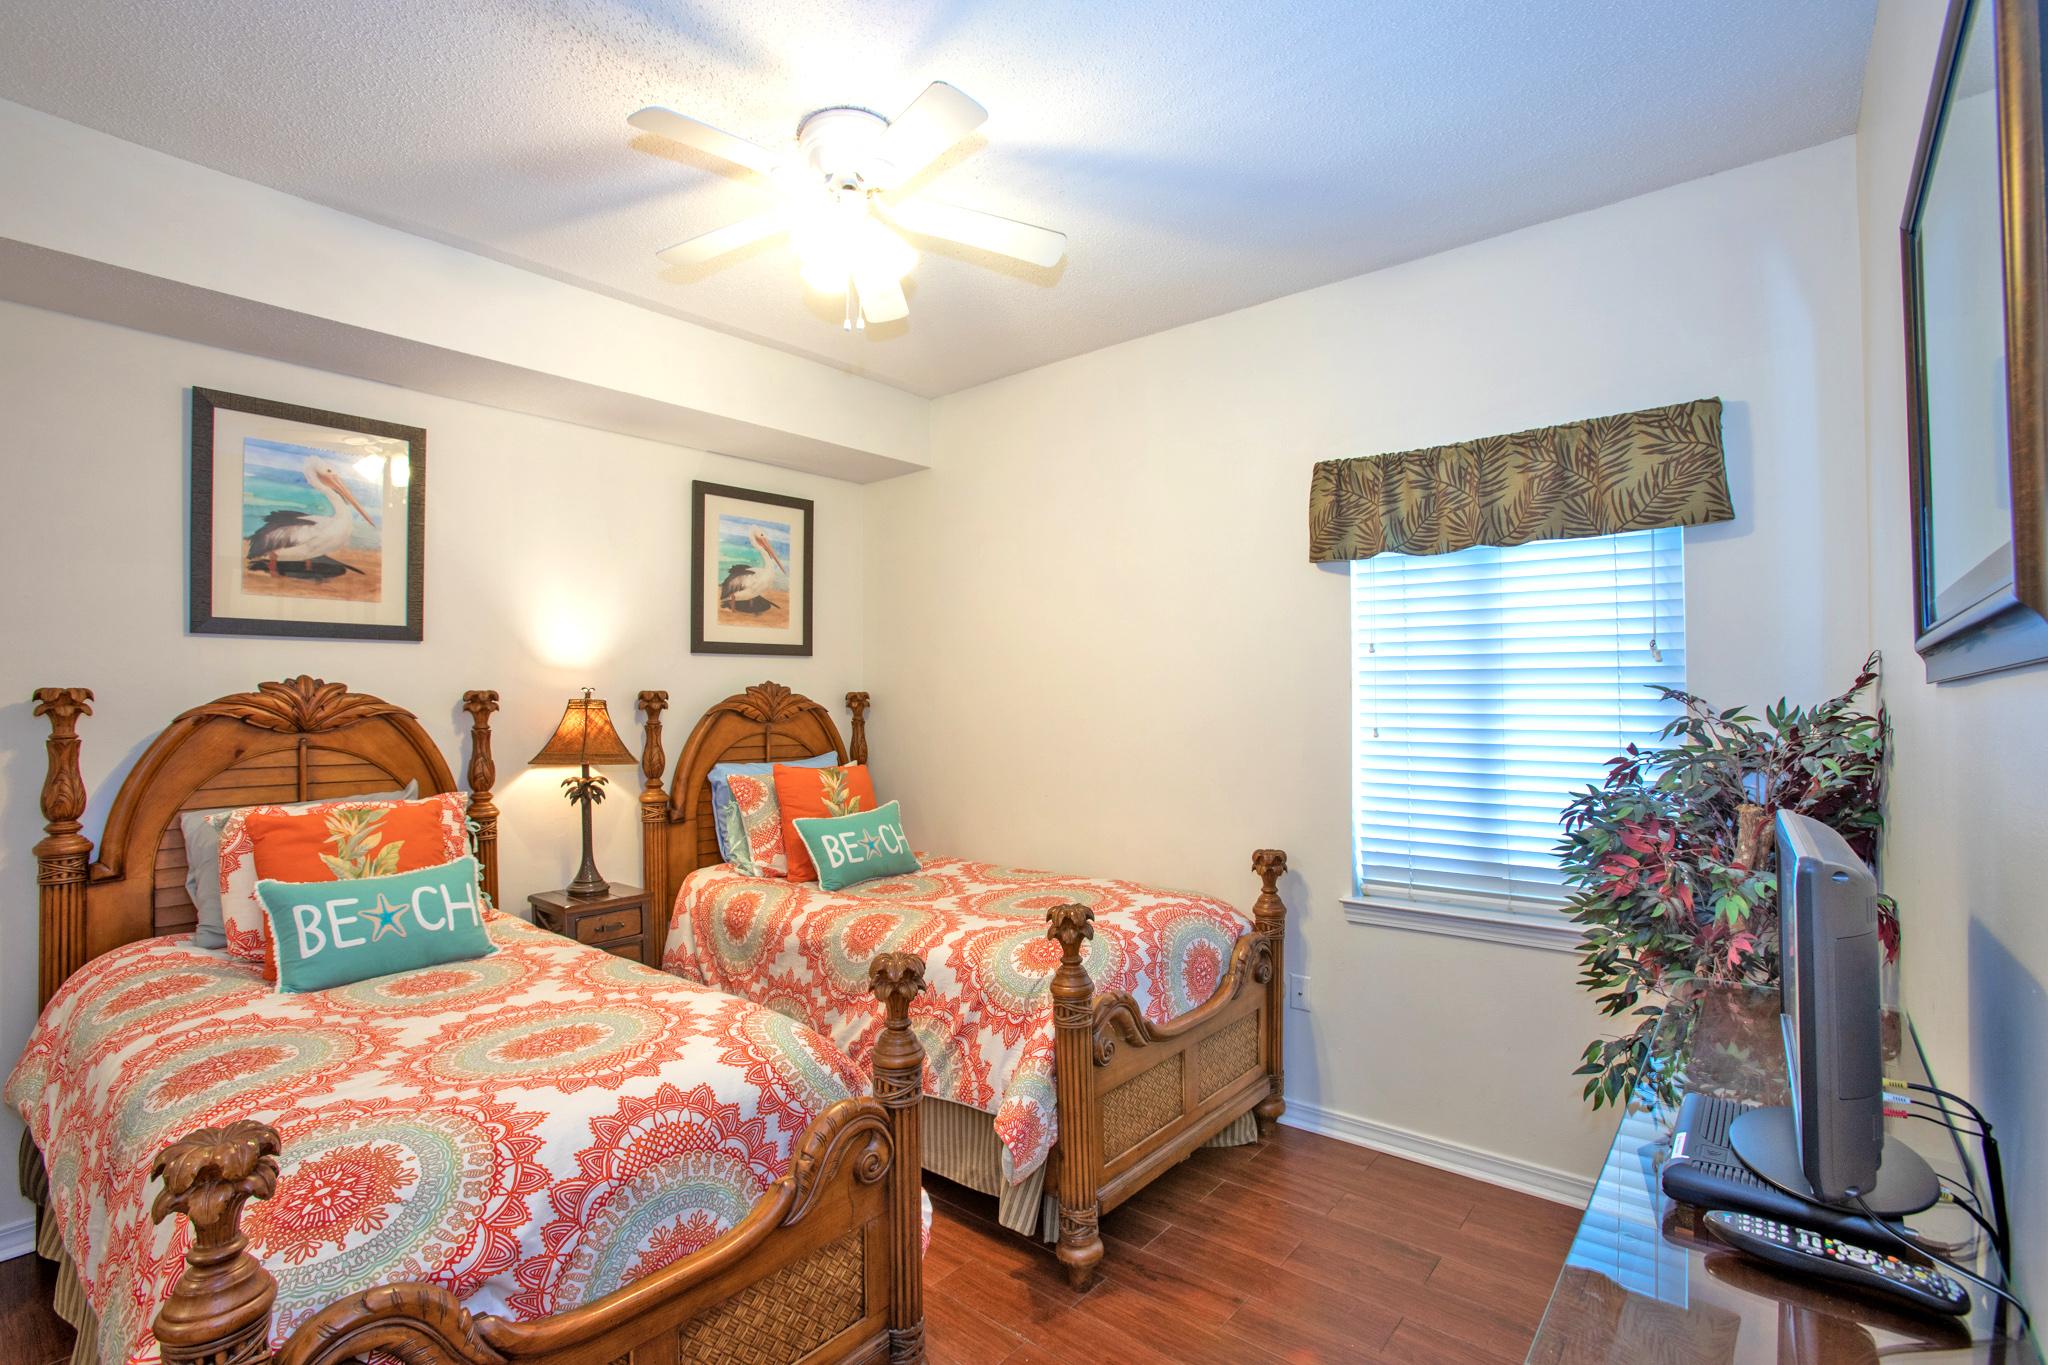 South Harbour #7E Condo rental in South Harbour ~ Pensacola Beach Vacation Rentals by BeachGuide in Pensacola Beach Florida - #5